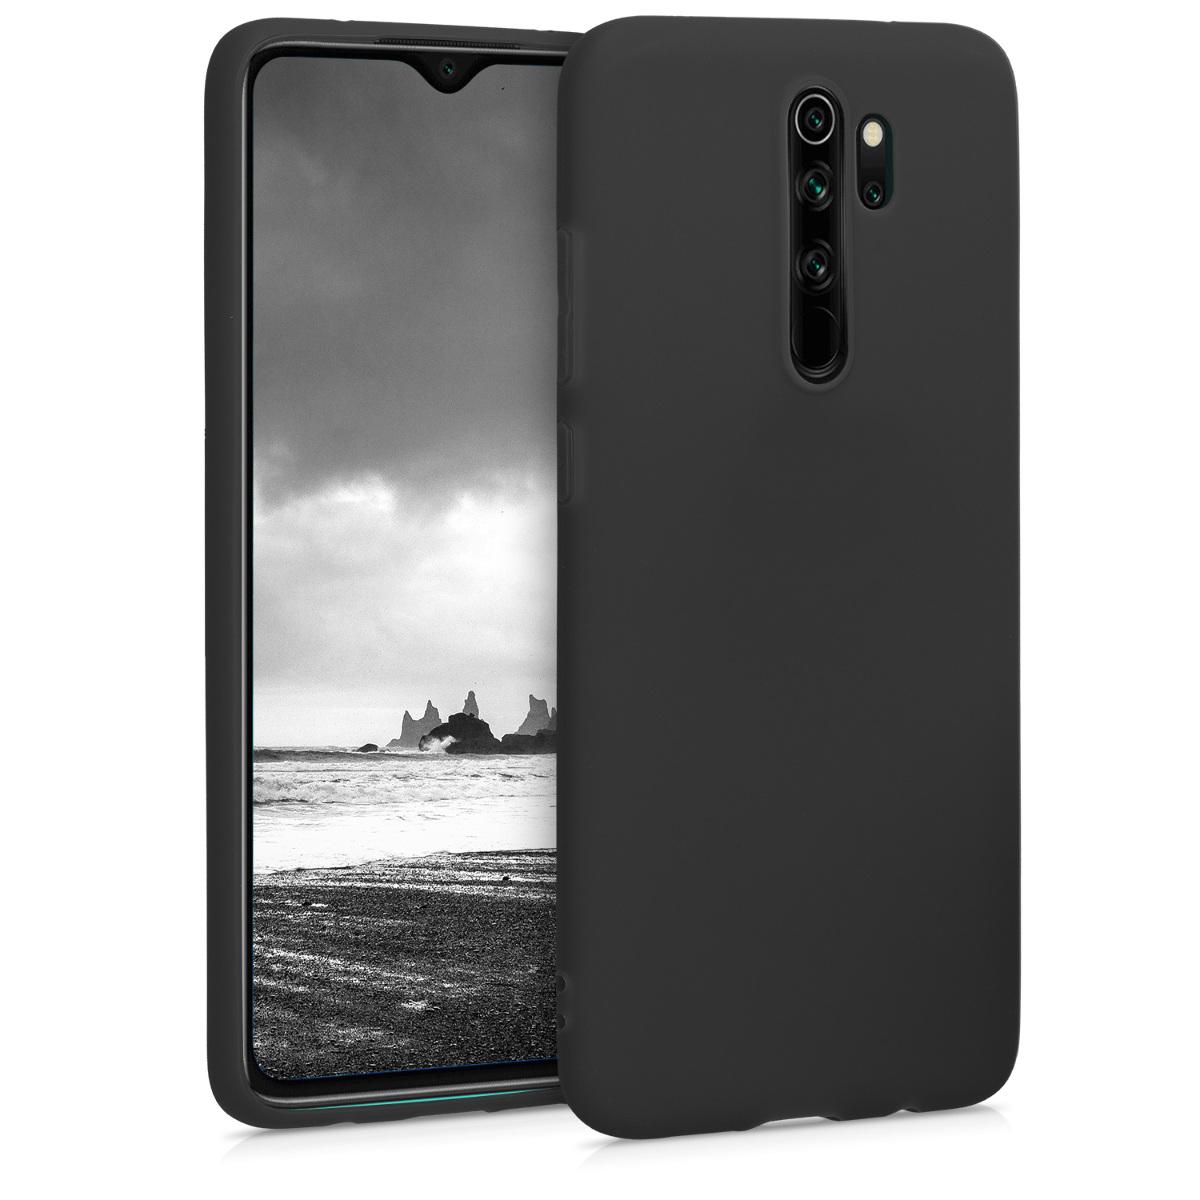 KW Θήκη Σιλικόνης Xiaomi Redmi Note 8 Pro - Black Matte (50242.47)